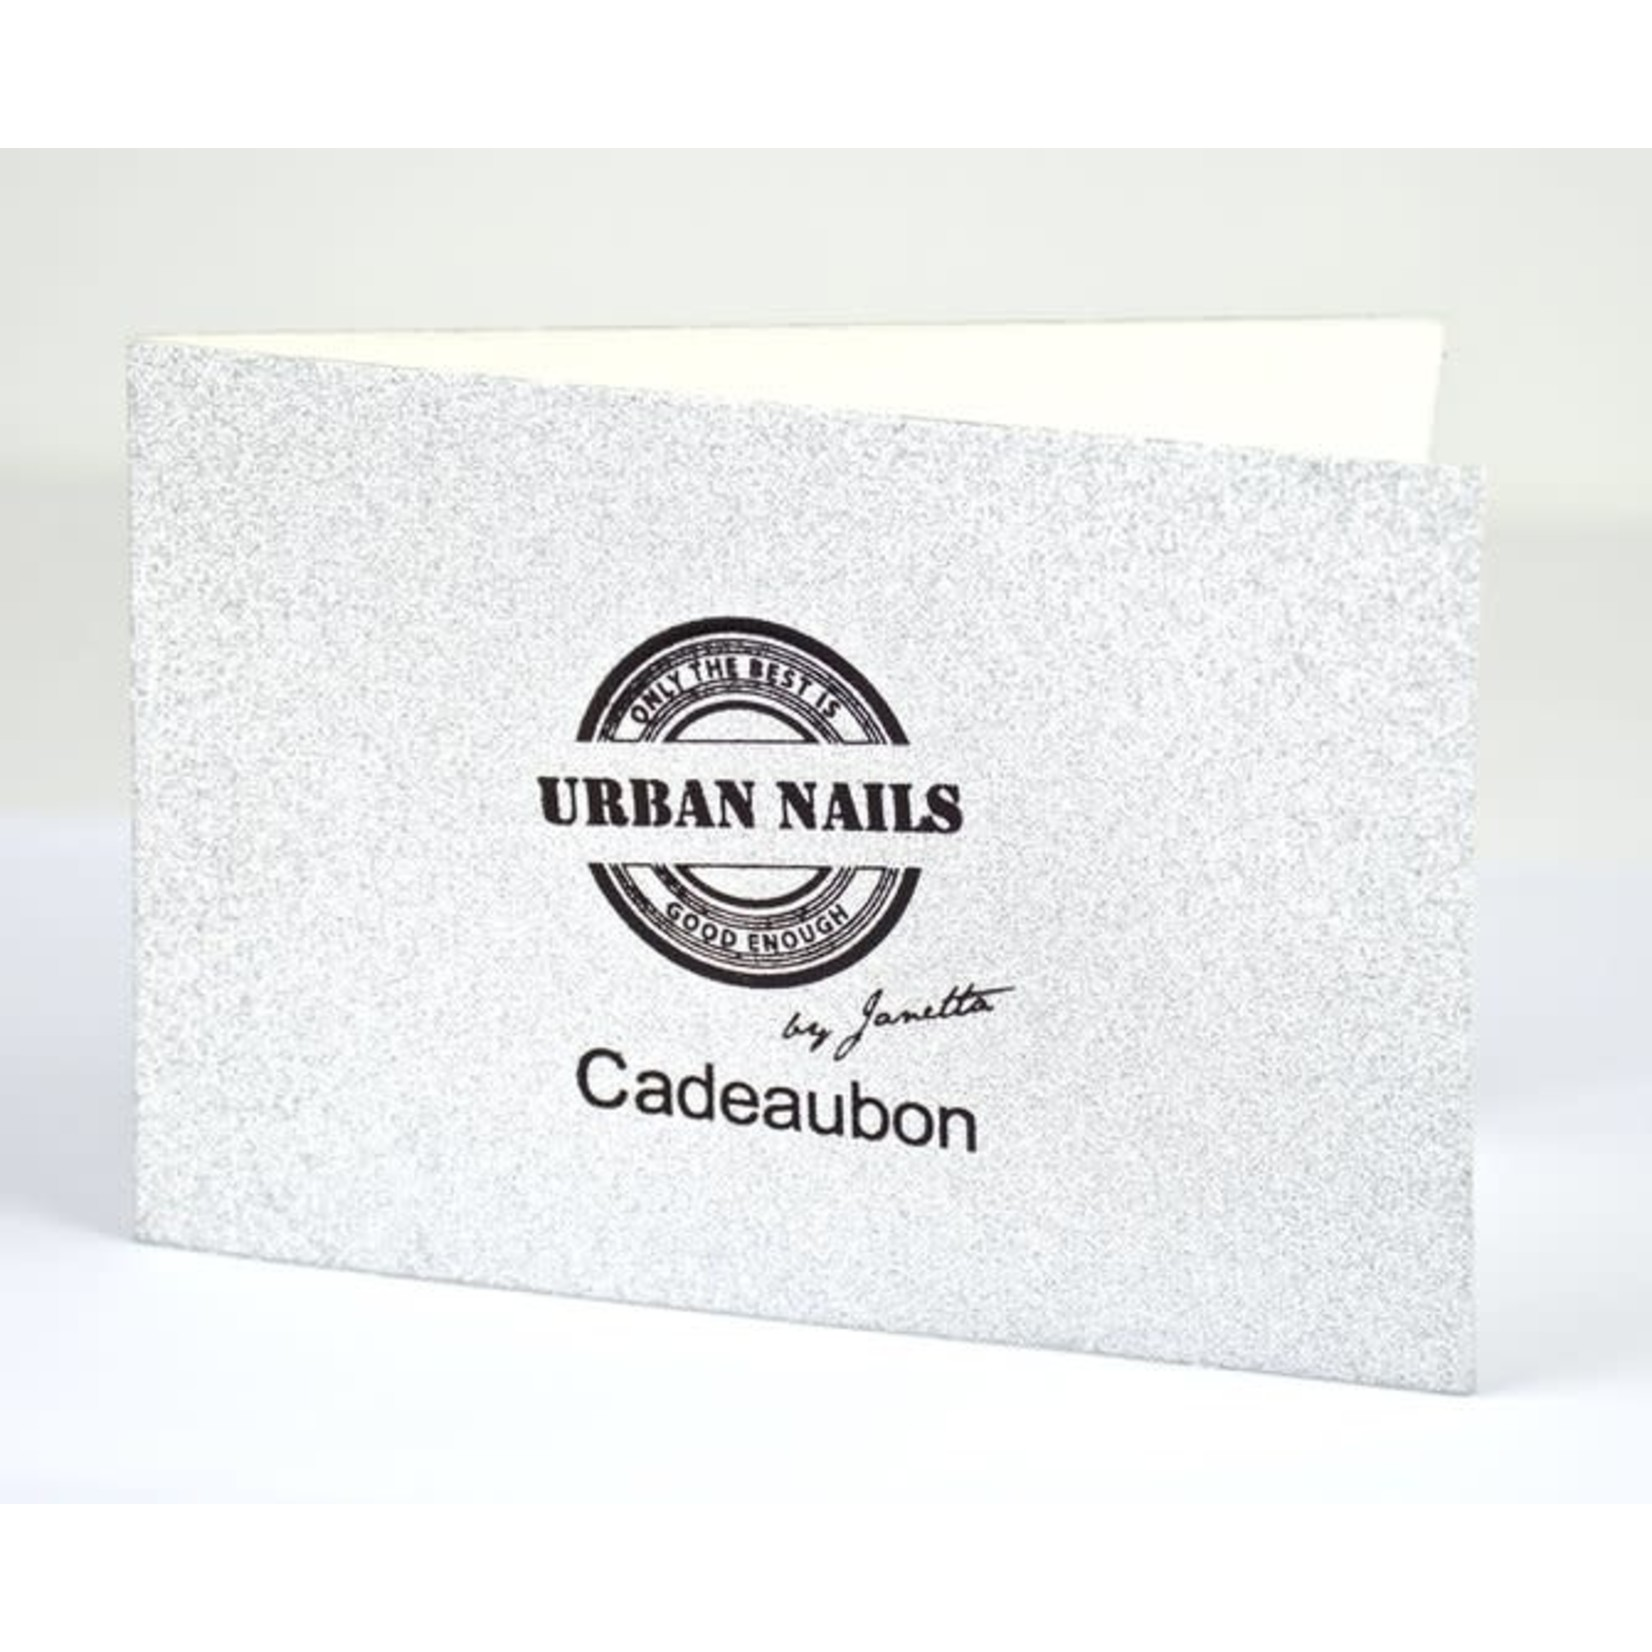 Urban Nails Cadeaubon leeg